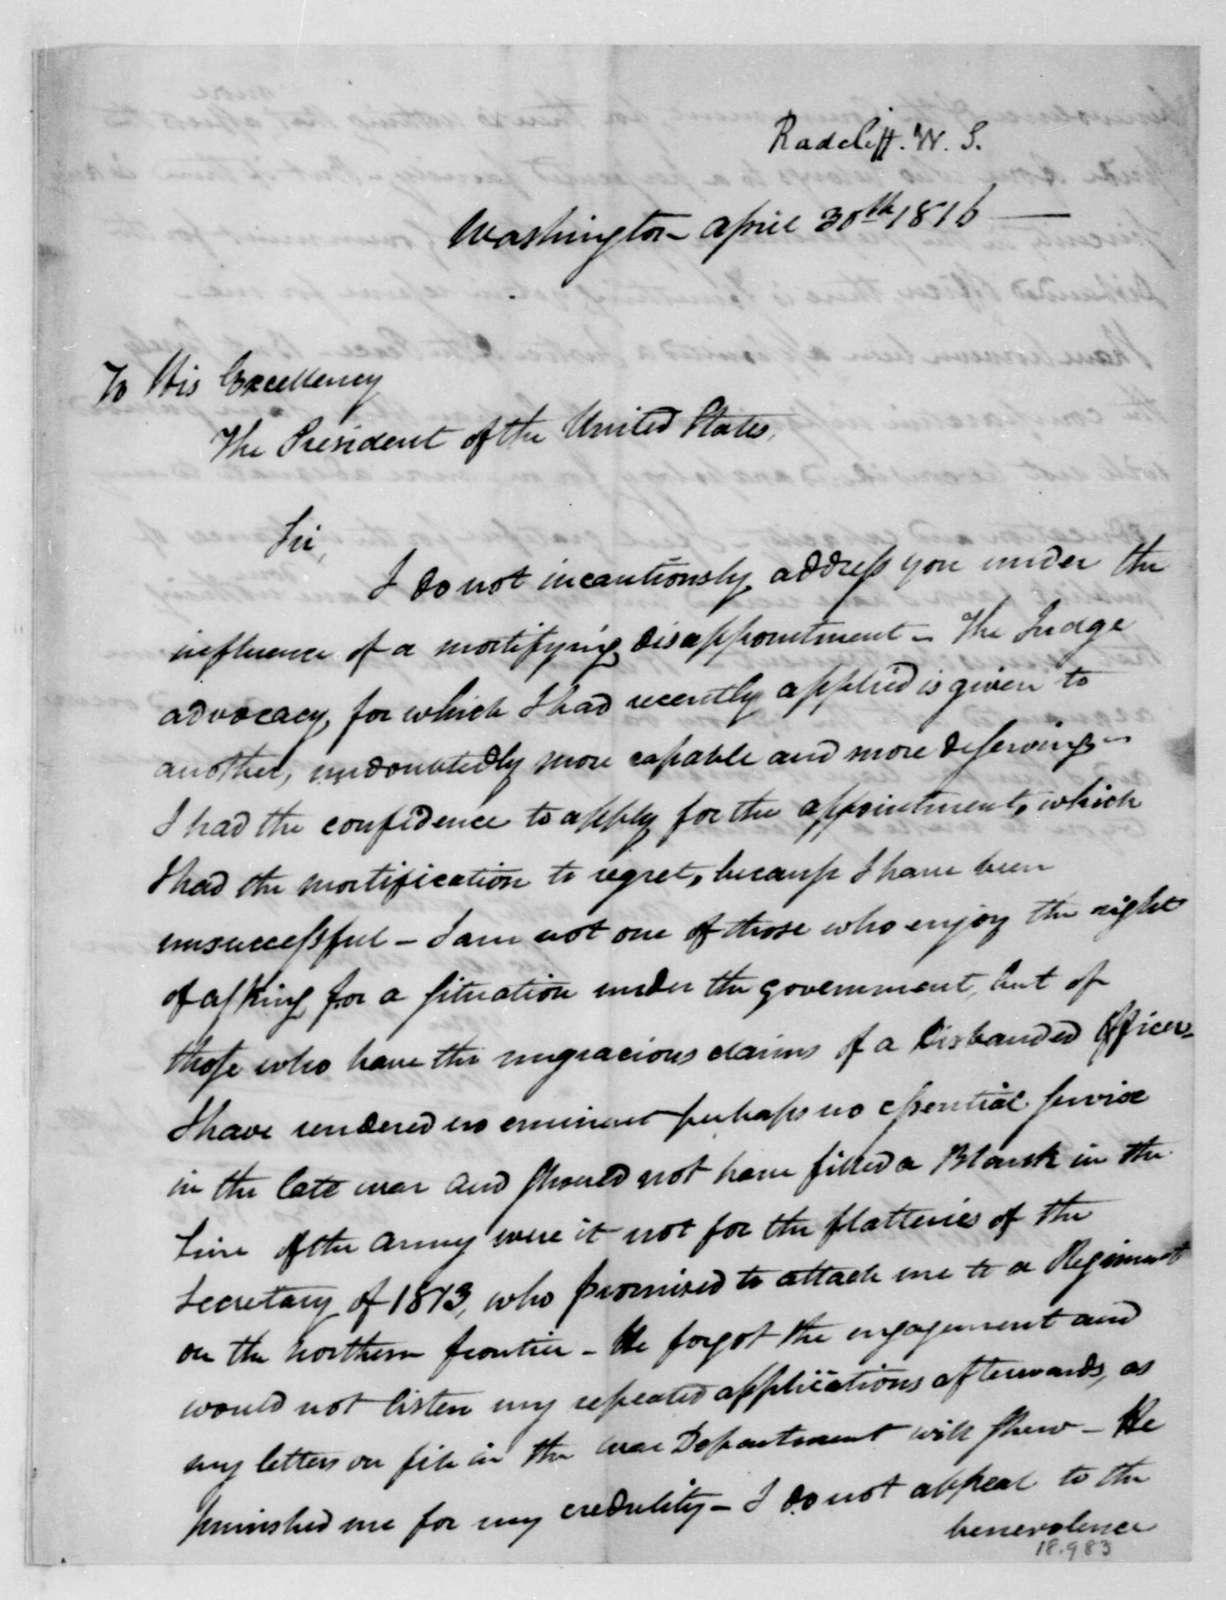 William S. Radcliff to James Madison, April 30, 1816.